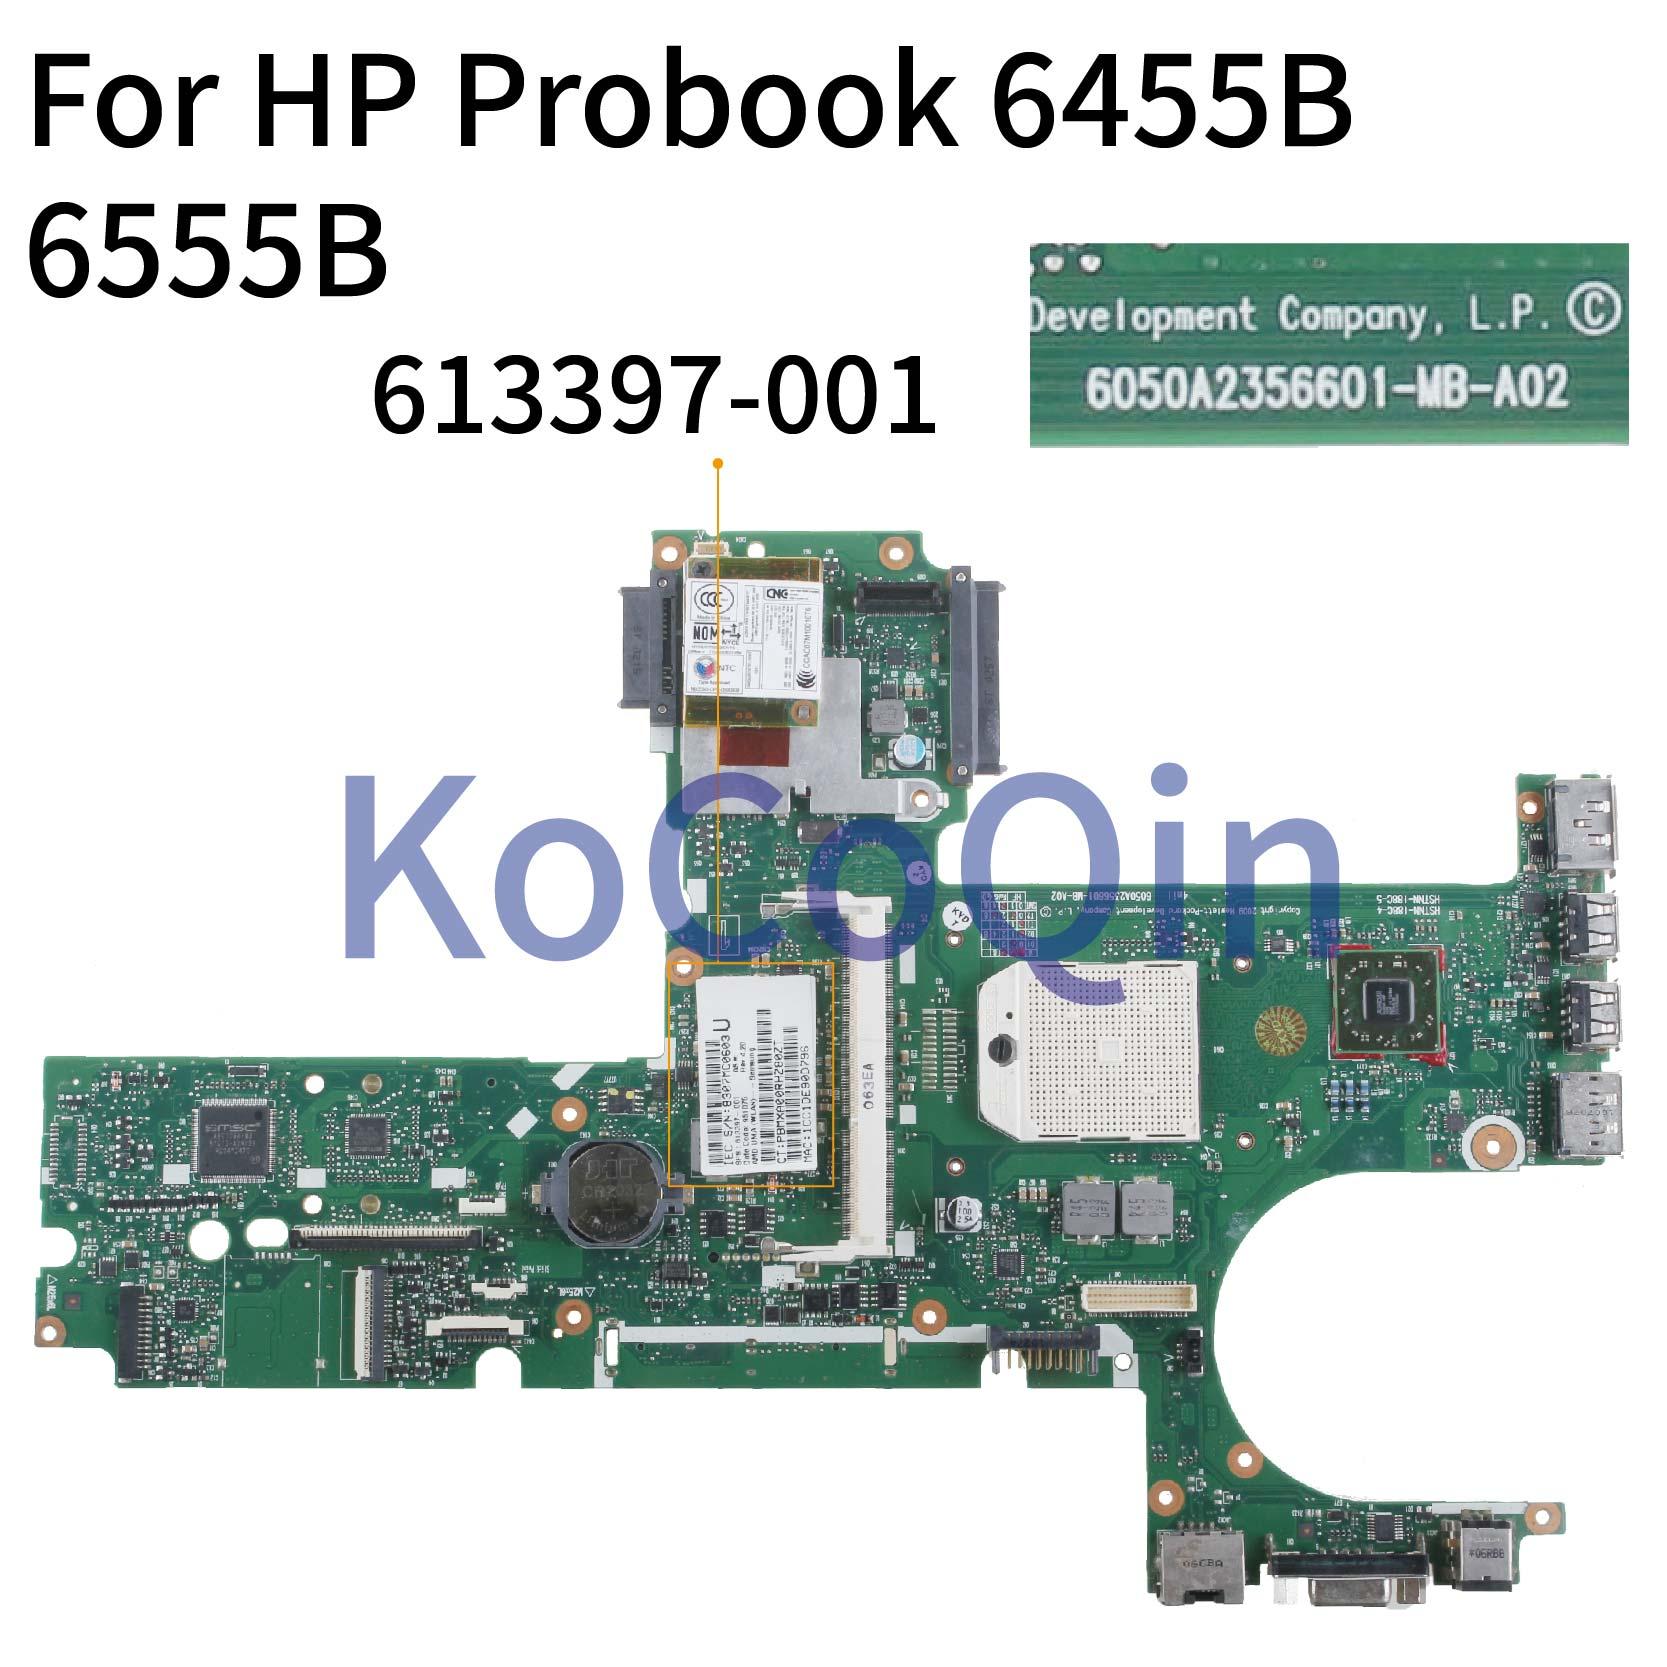 KoCoQin Laptop Motherboard For HP Probook 6455B 6555B Socket S1 Mainboard 613397-001 613397-501 6050A2356601-MB-A02